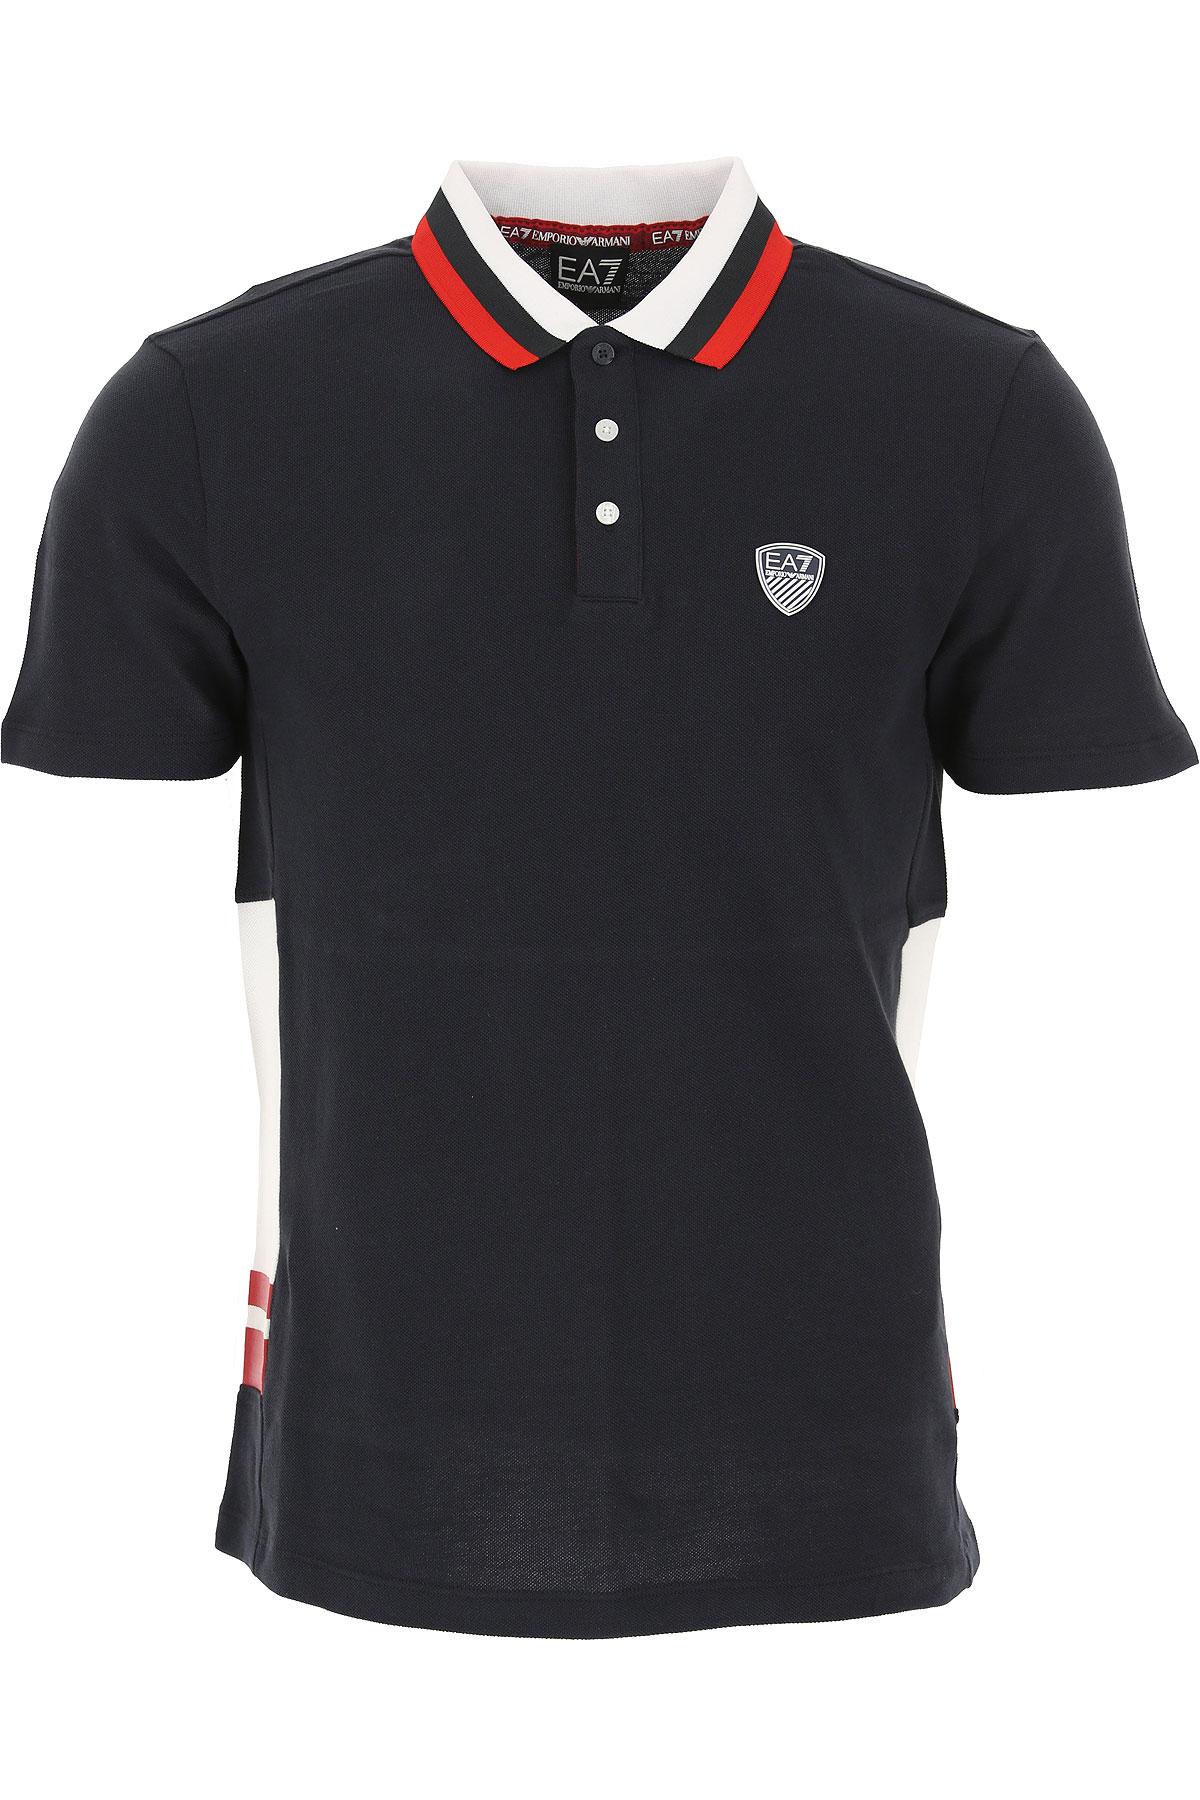 251cc071 Mens Clothing Emporio Armani, Style code: 3gpf82-pj61z-1578